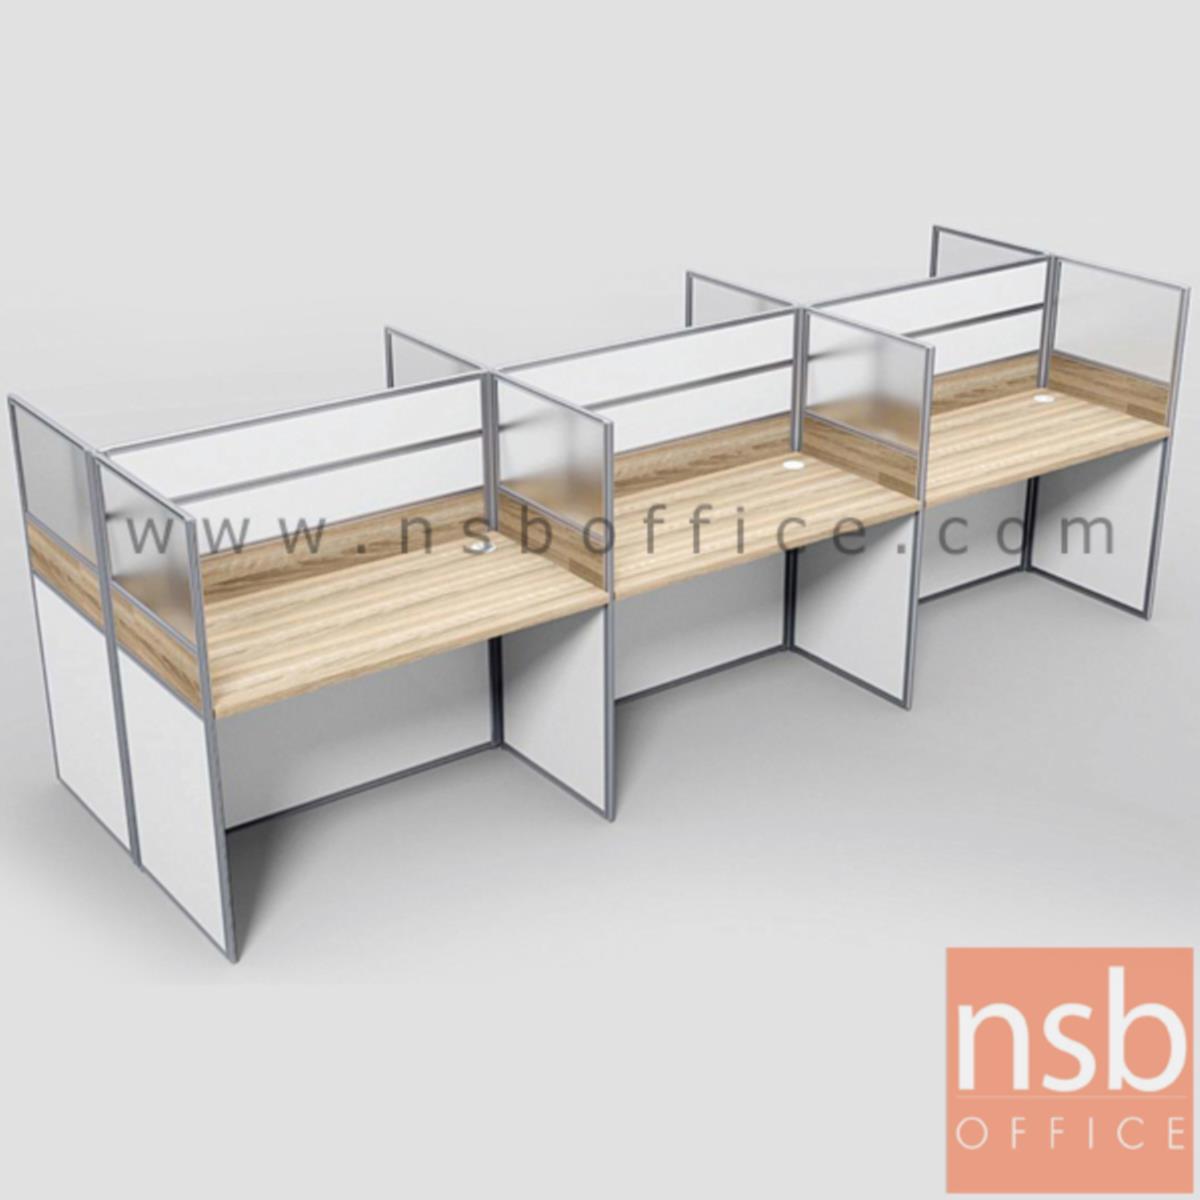 A04A195:ชุดโต๊ะทำงานกลุ่มหน้าตรง 6 ที่นั่ง รุ่น Barcadi 10 (บาร์คาดี้ 10) ขนาดรวม 368W ,458W cm. มีและไม่มีตู้แขวนเอกสาร